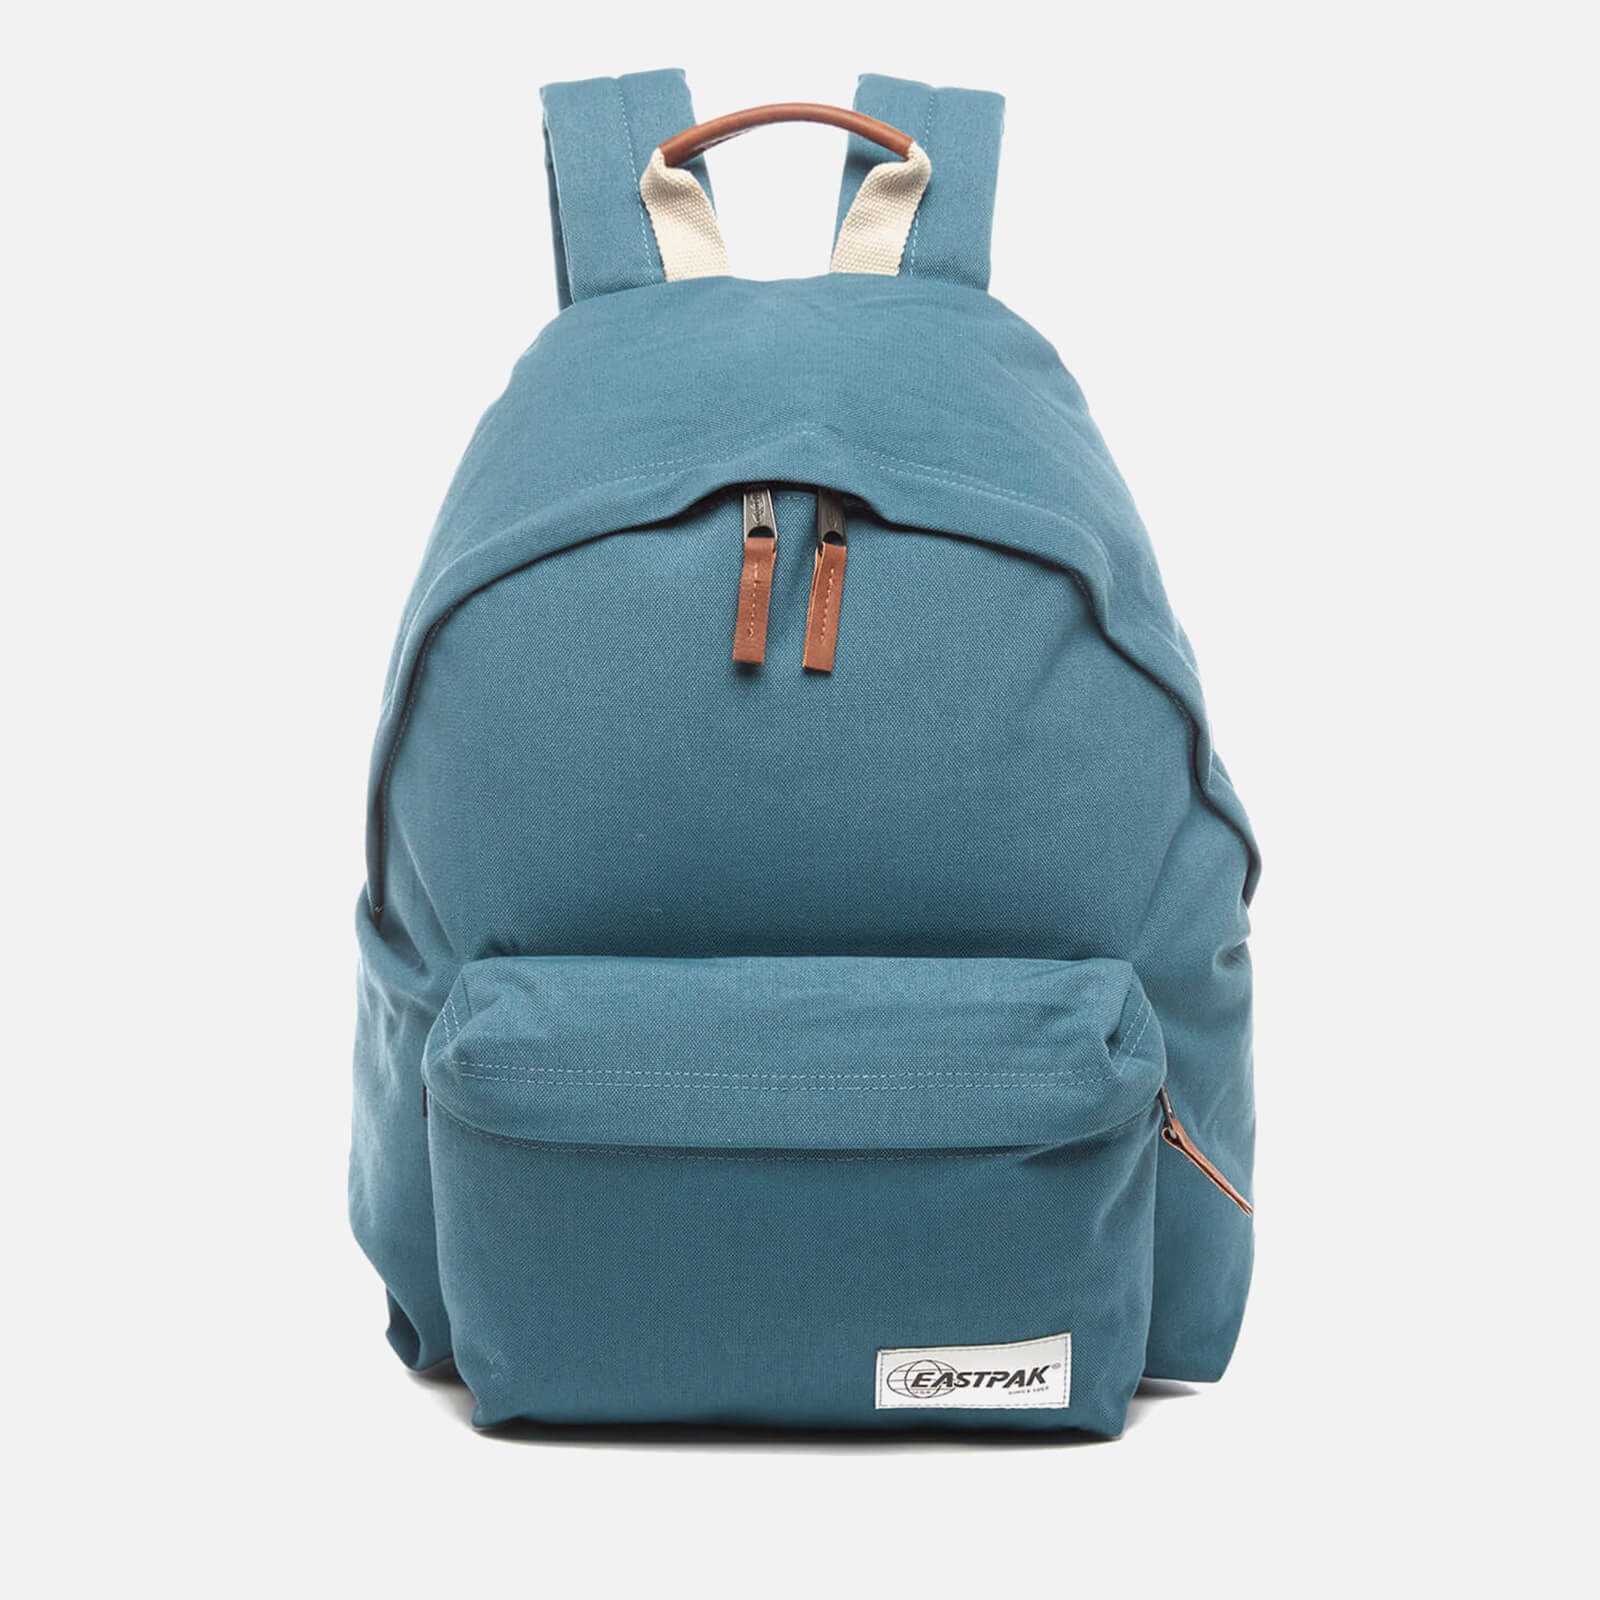 28a366cf094 Eastpak Padded Pak'r Opgrade Backpack - Opgrade Light Blue - Free UK  Delivery over £50